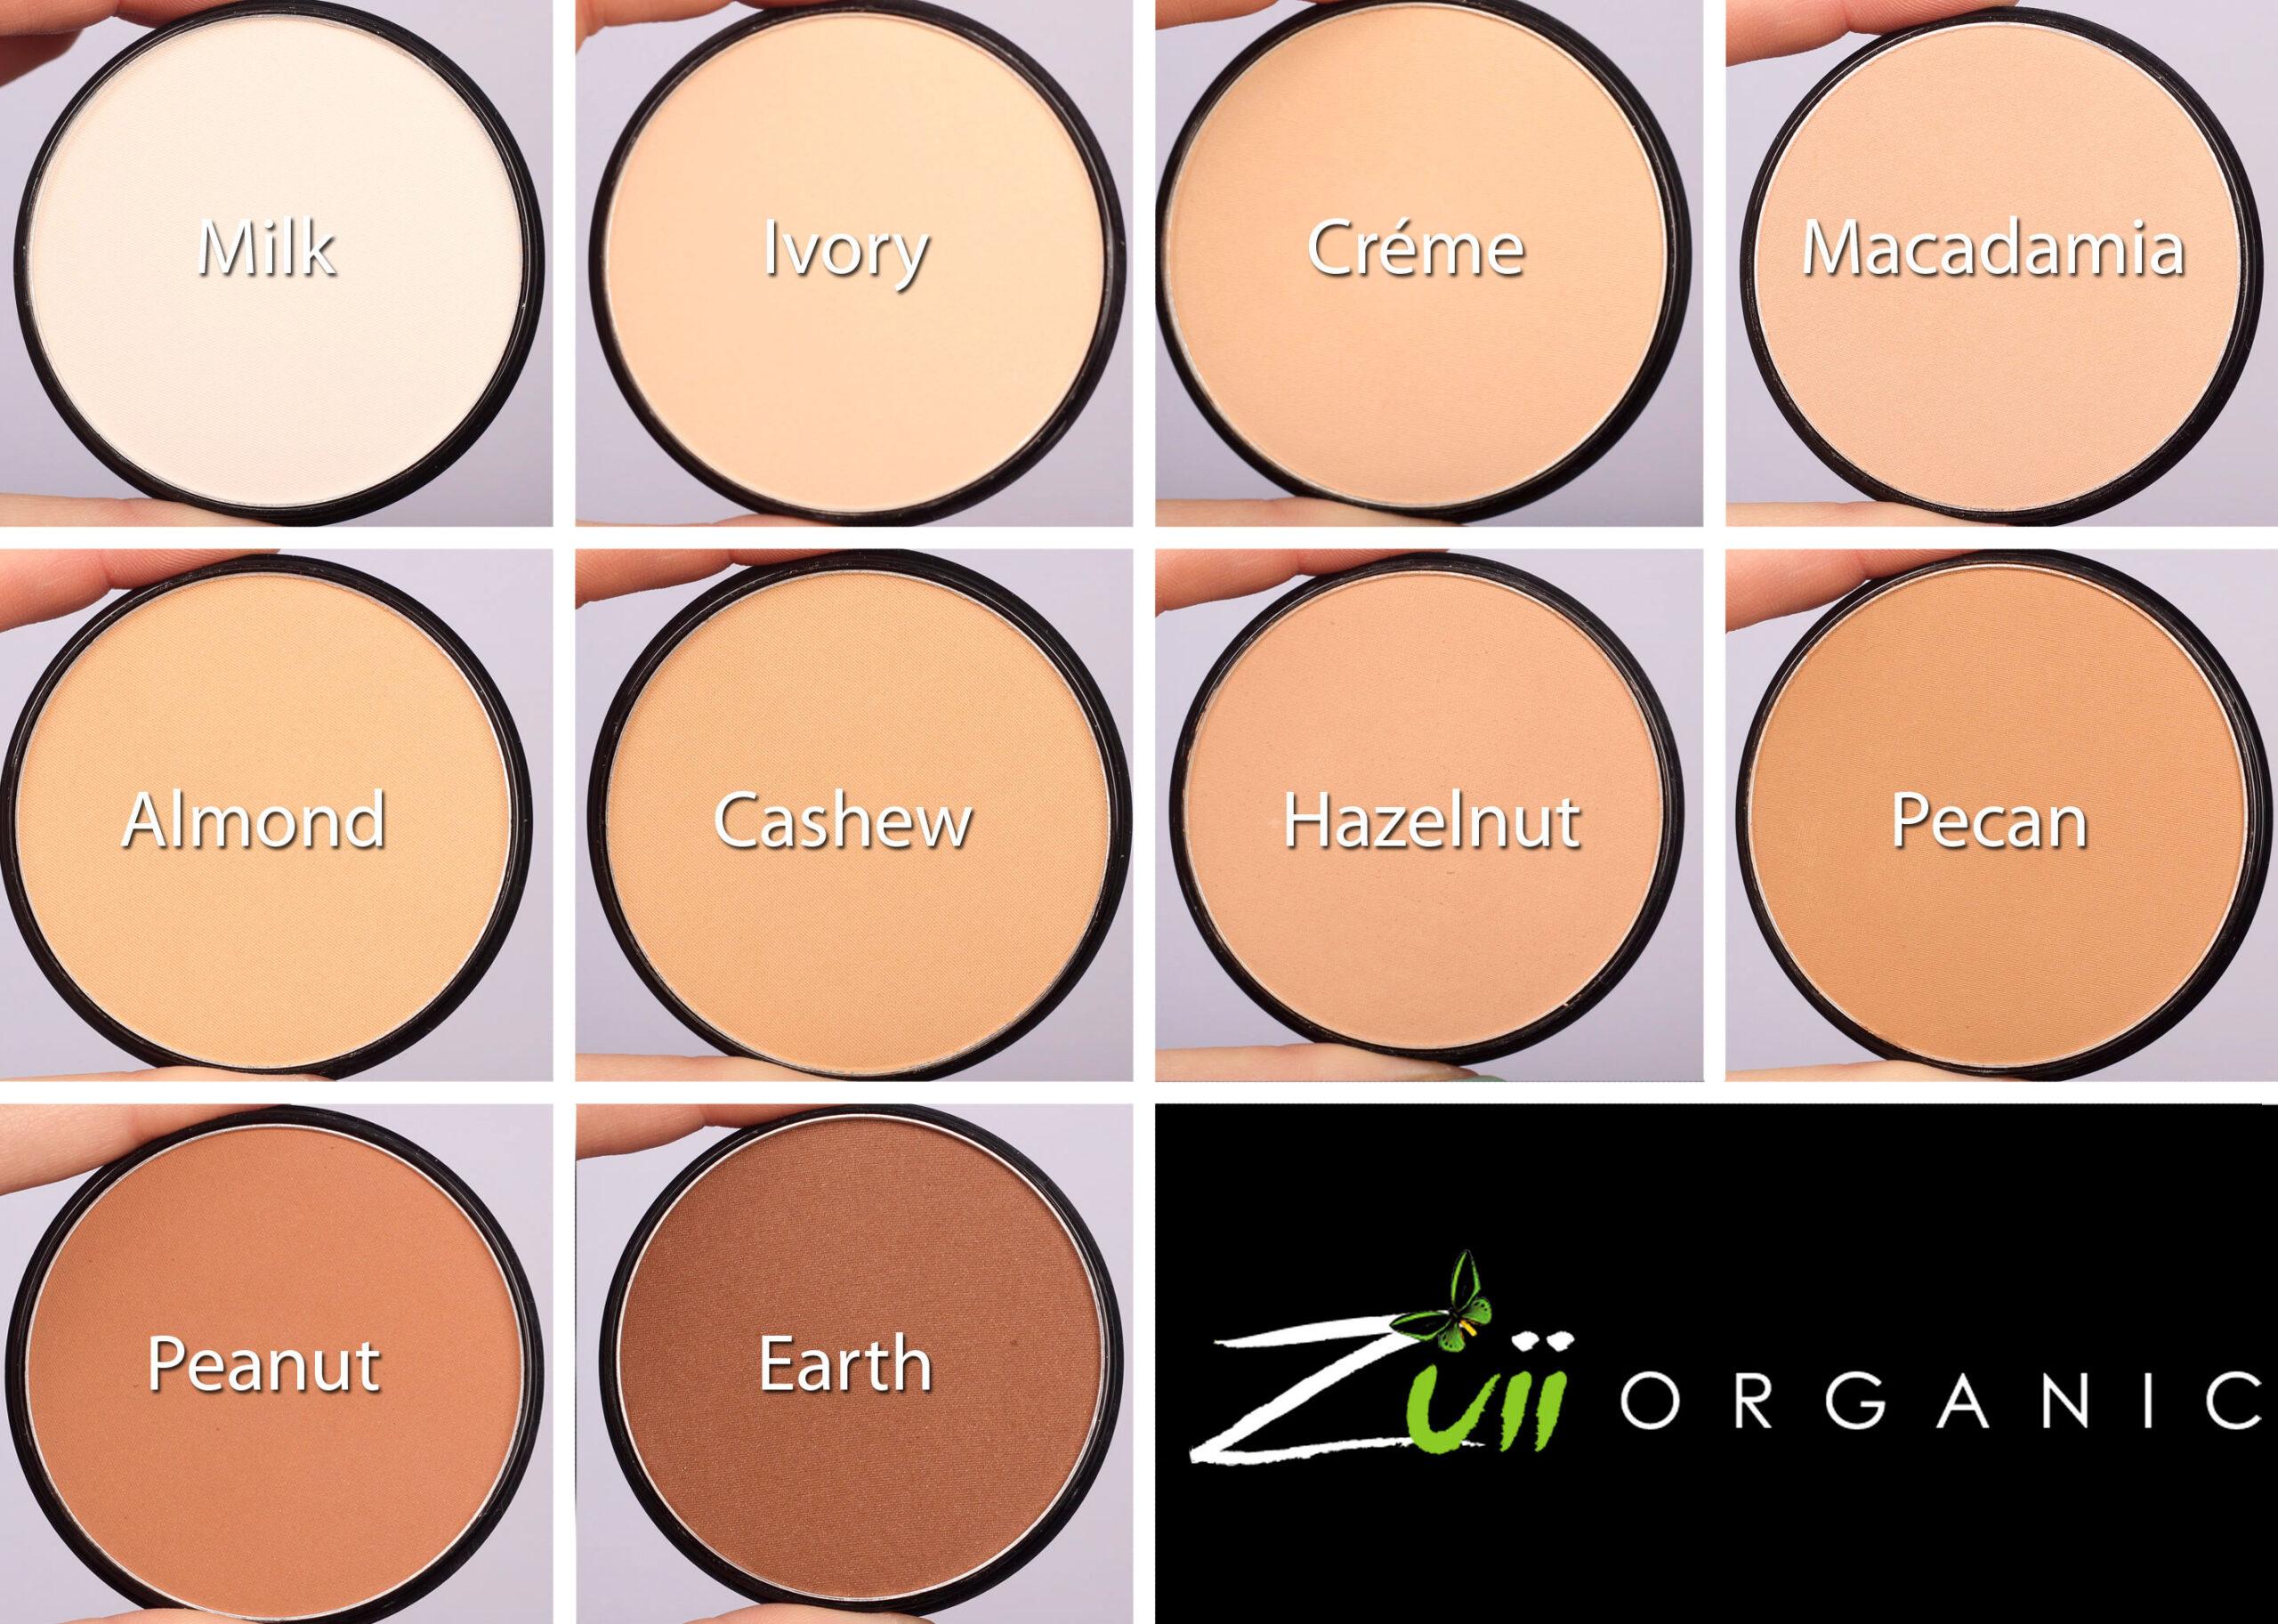 00zuii-organic-powder-foundation-swatch_1